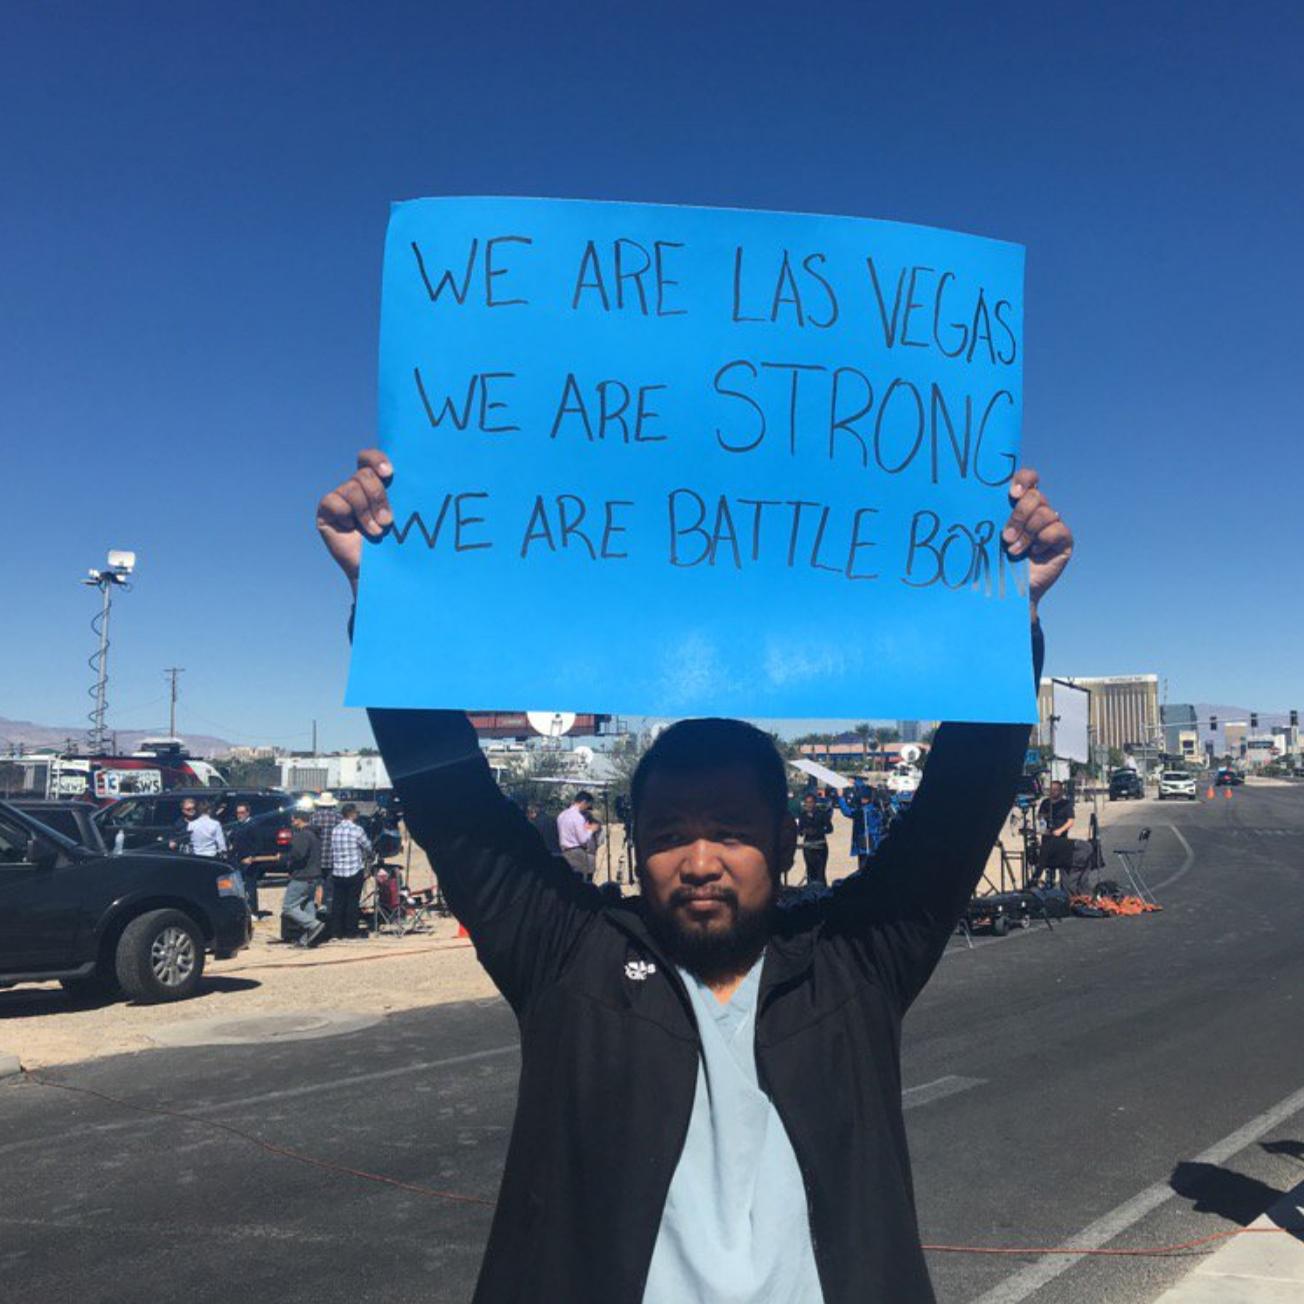 #LasVegasShooting: Amid Chaos and Terror, Stories of Heroism Emerge